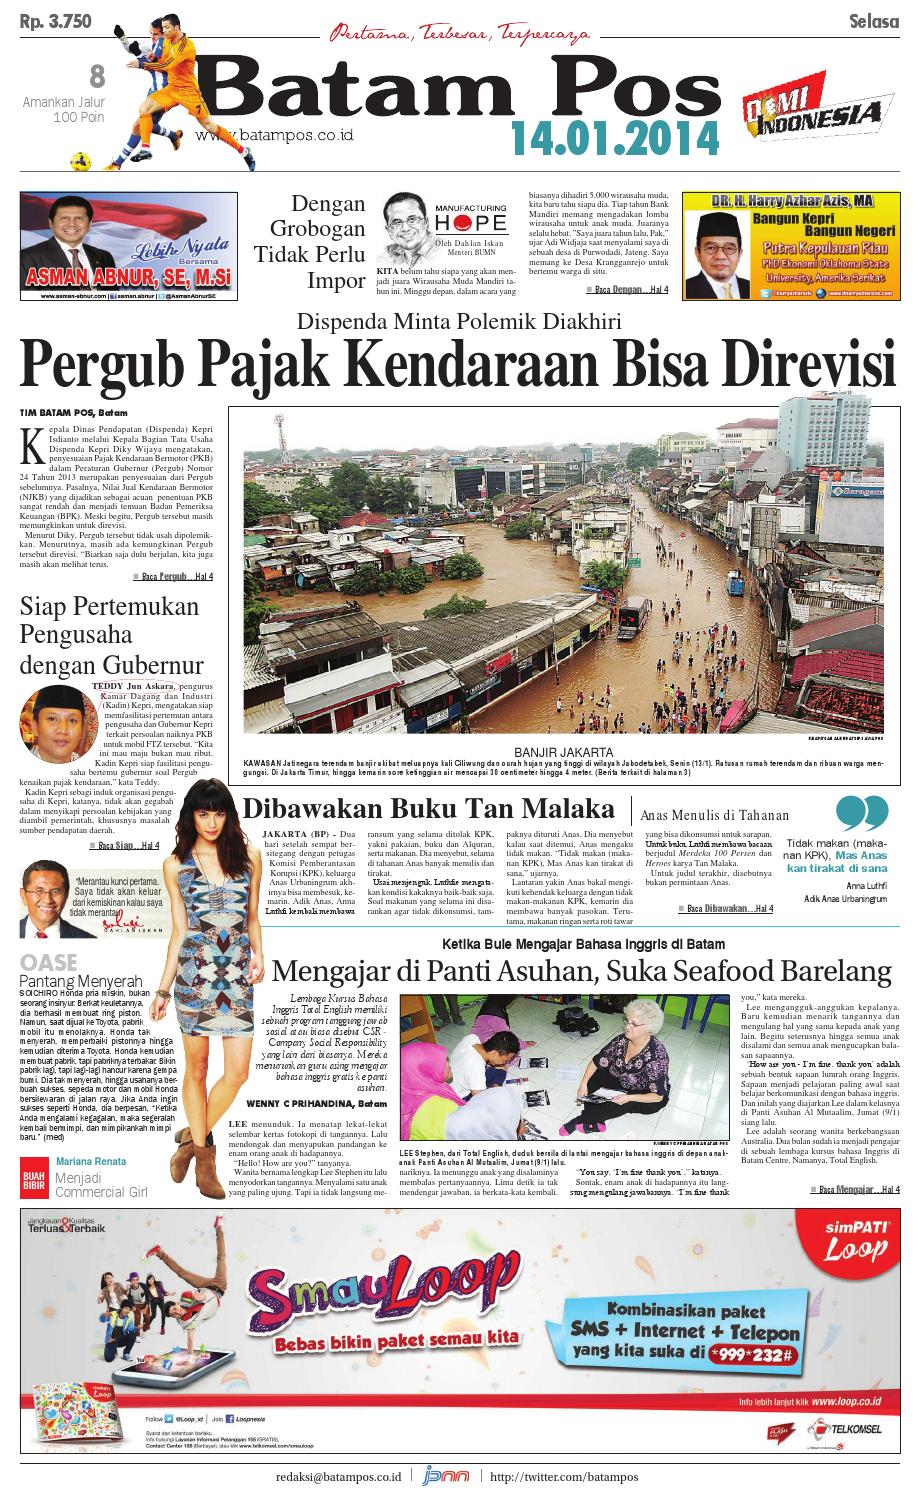 14 Januari 2014 By Batampos Newspaper Issuu Produk Ukm Bumn Tas Ransel Threepoint